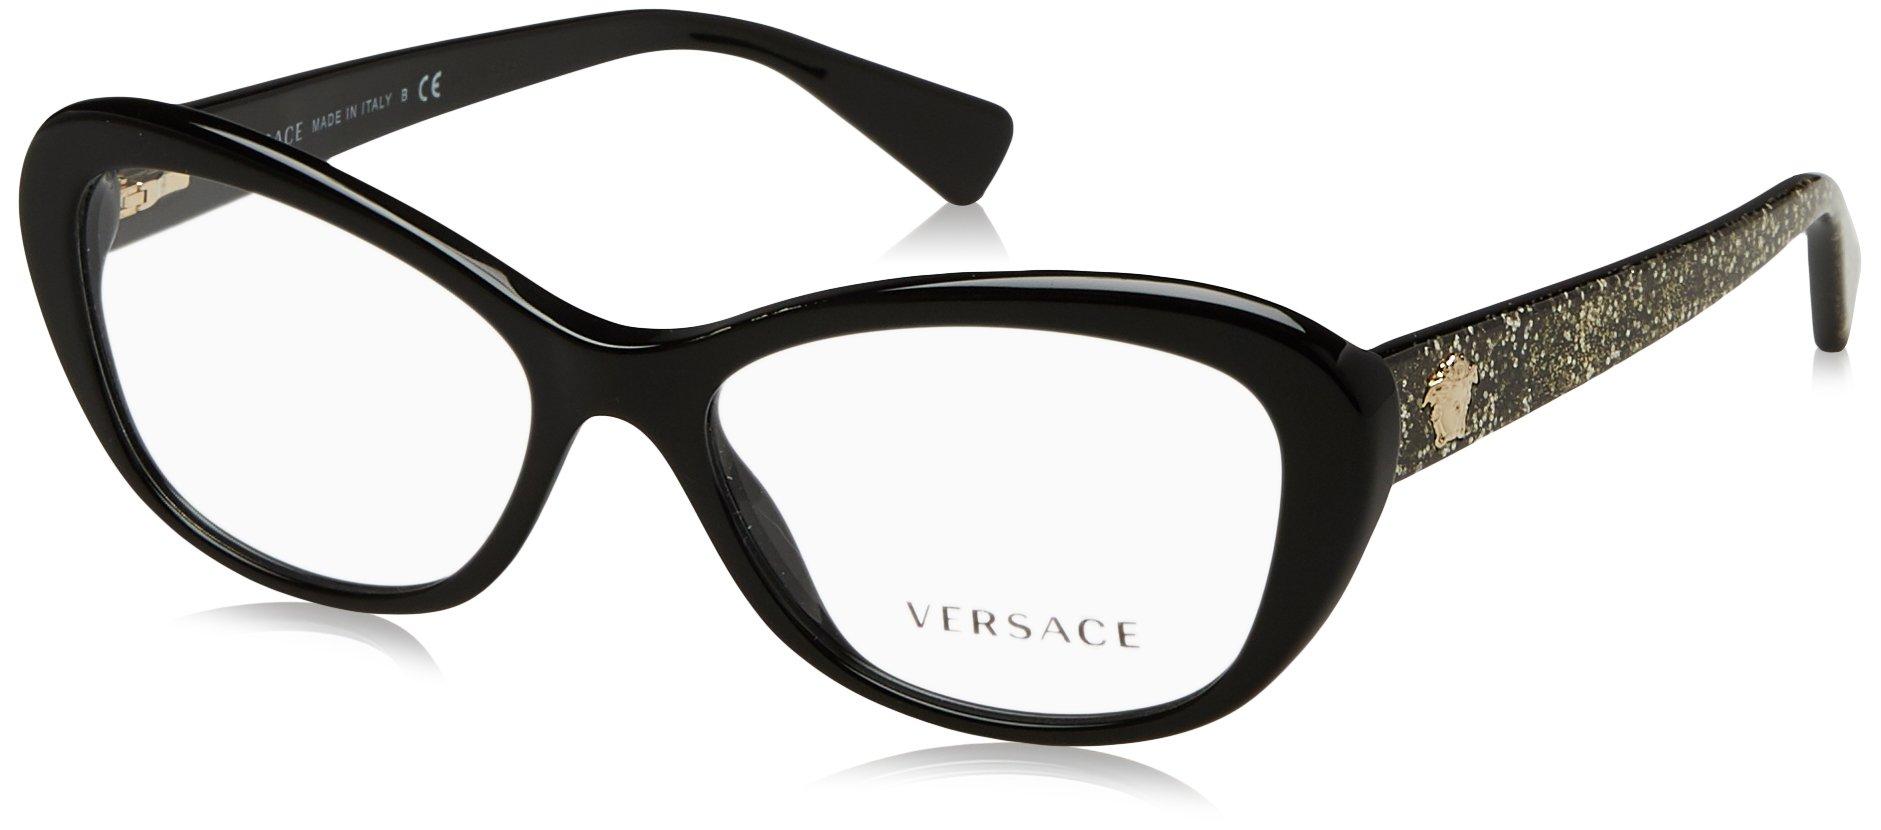 Versace VE3216 Eyeglass Frames 5156-54 - Black